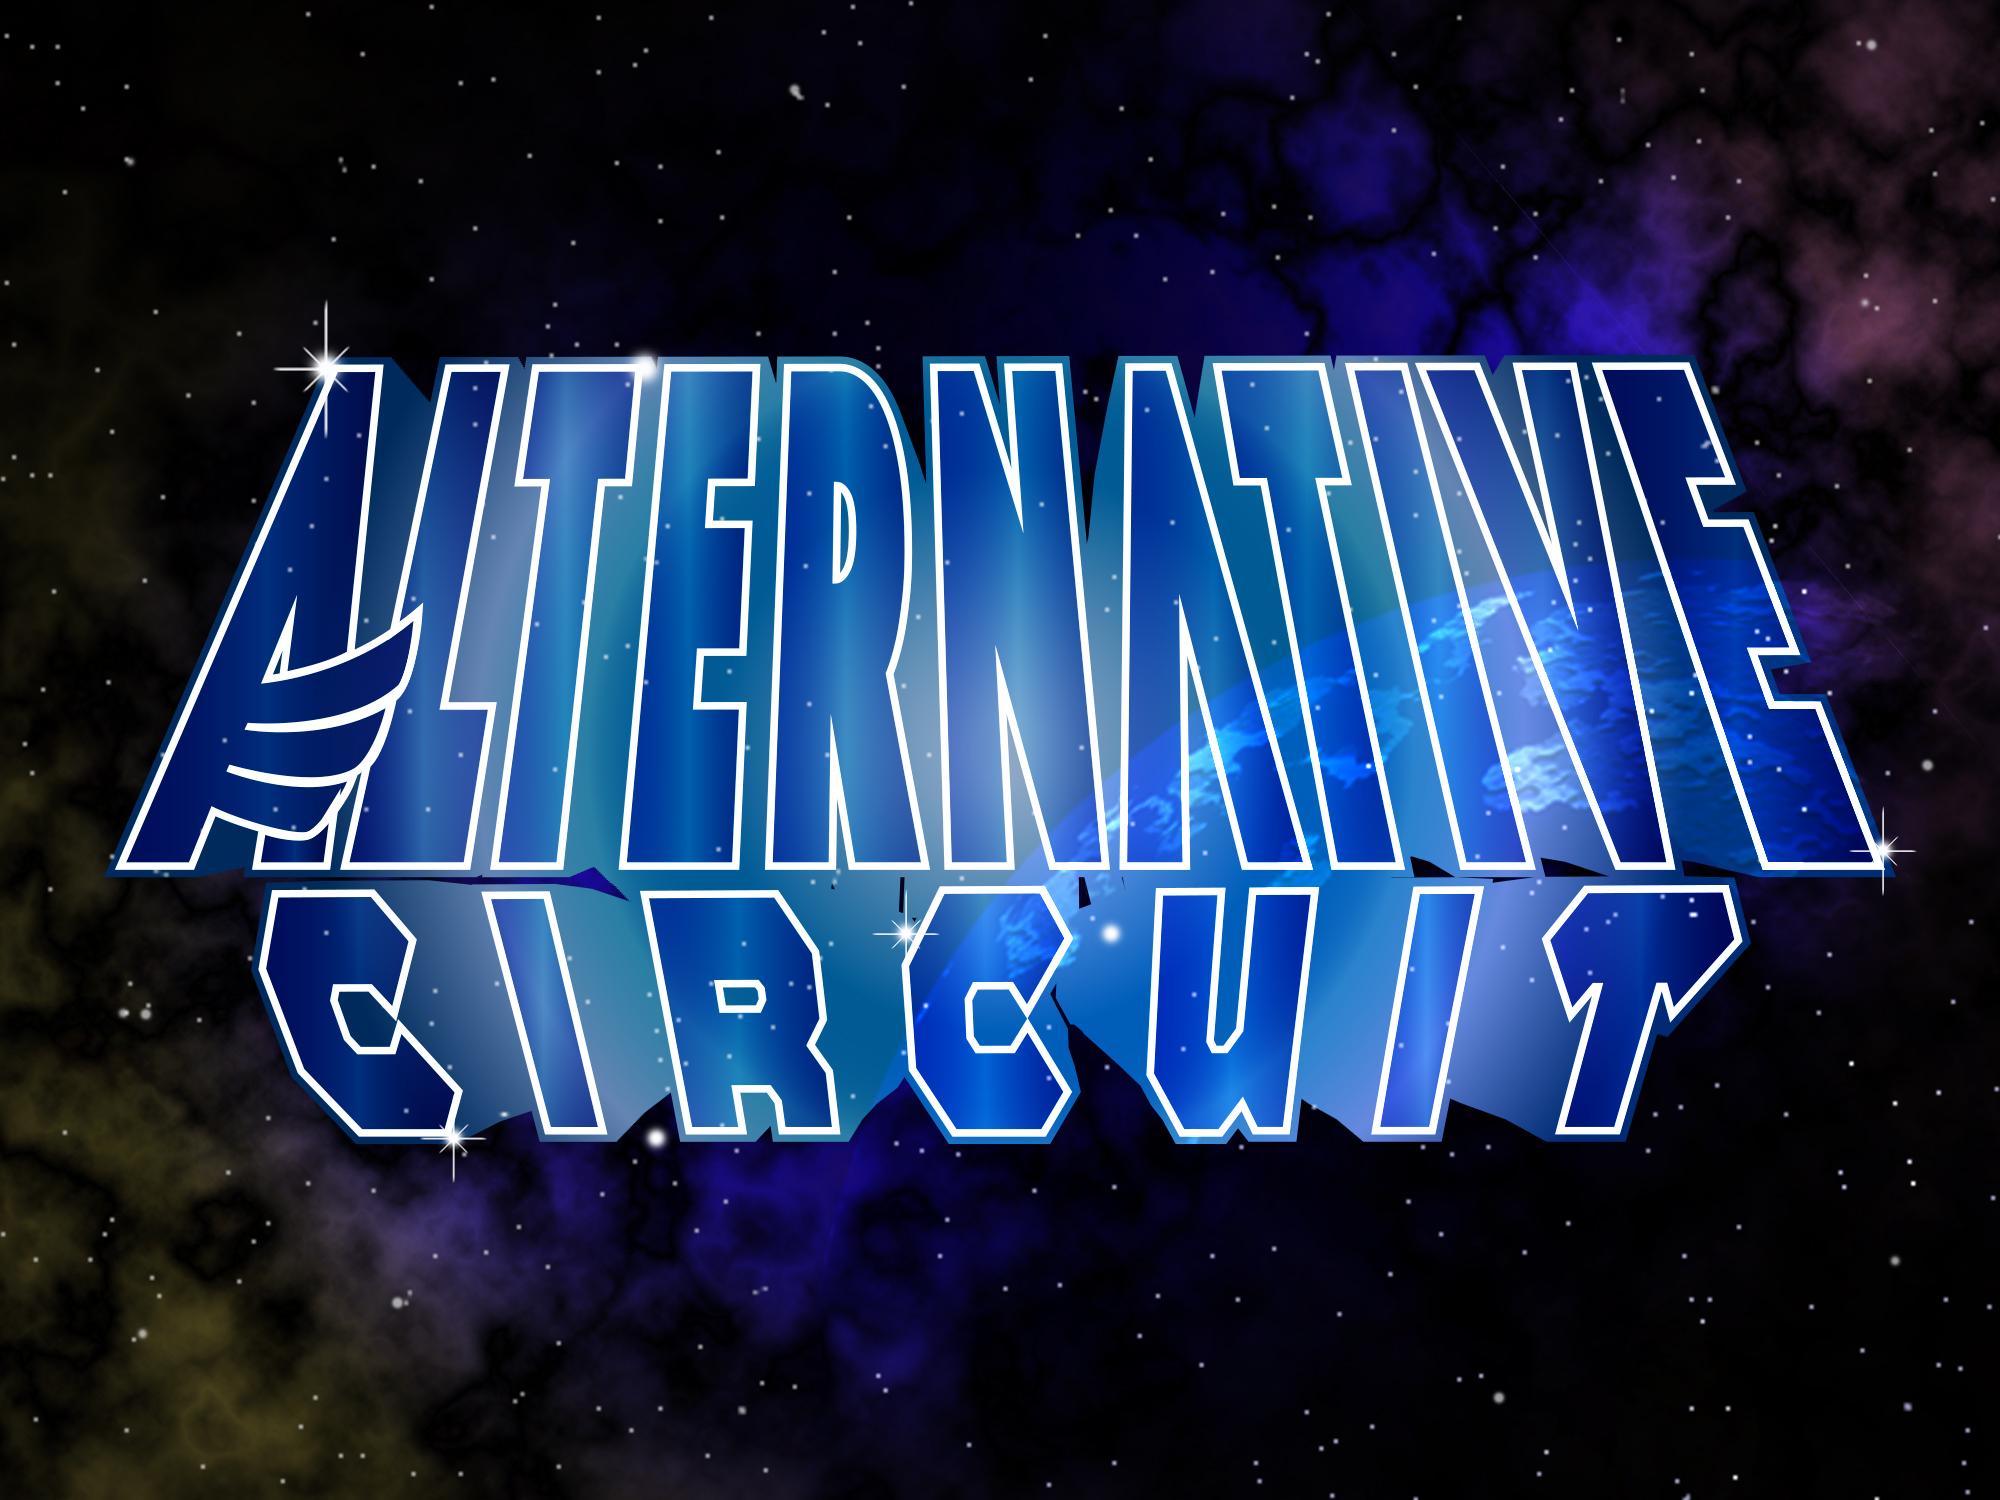 Alternativecircuit_logo